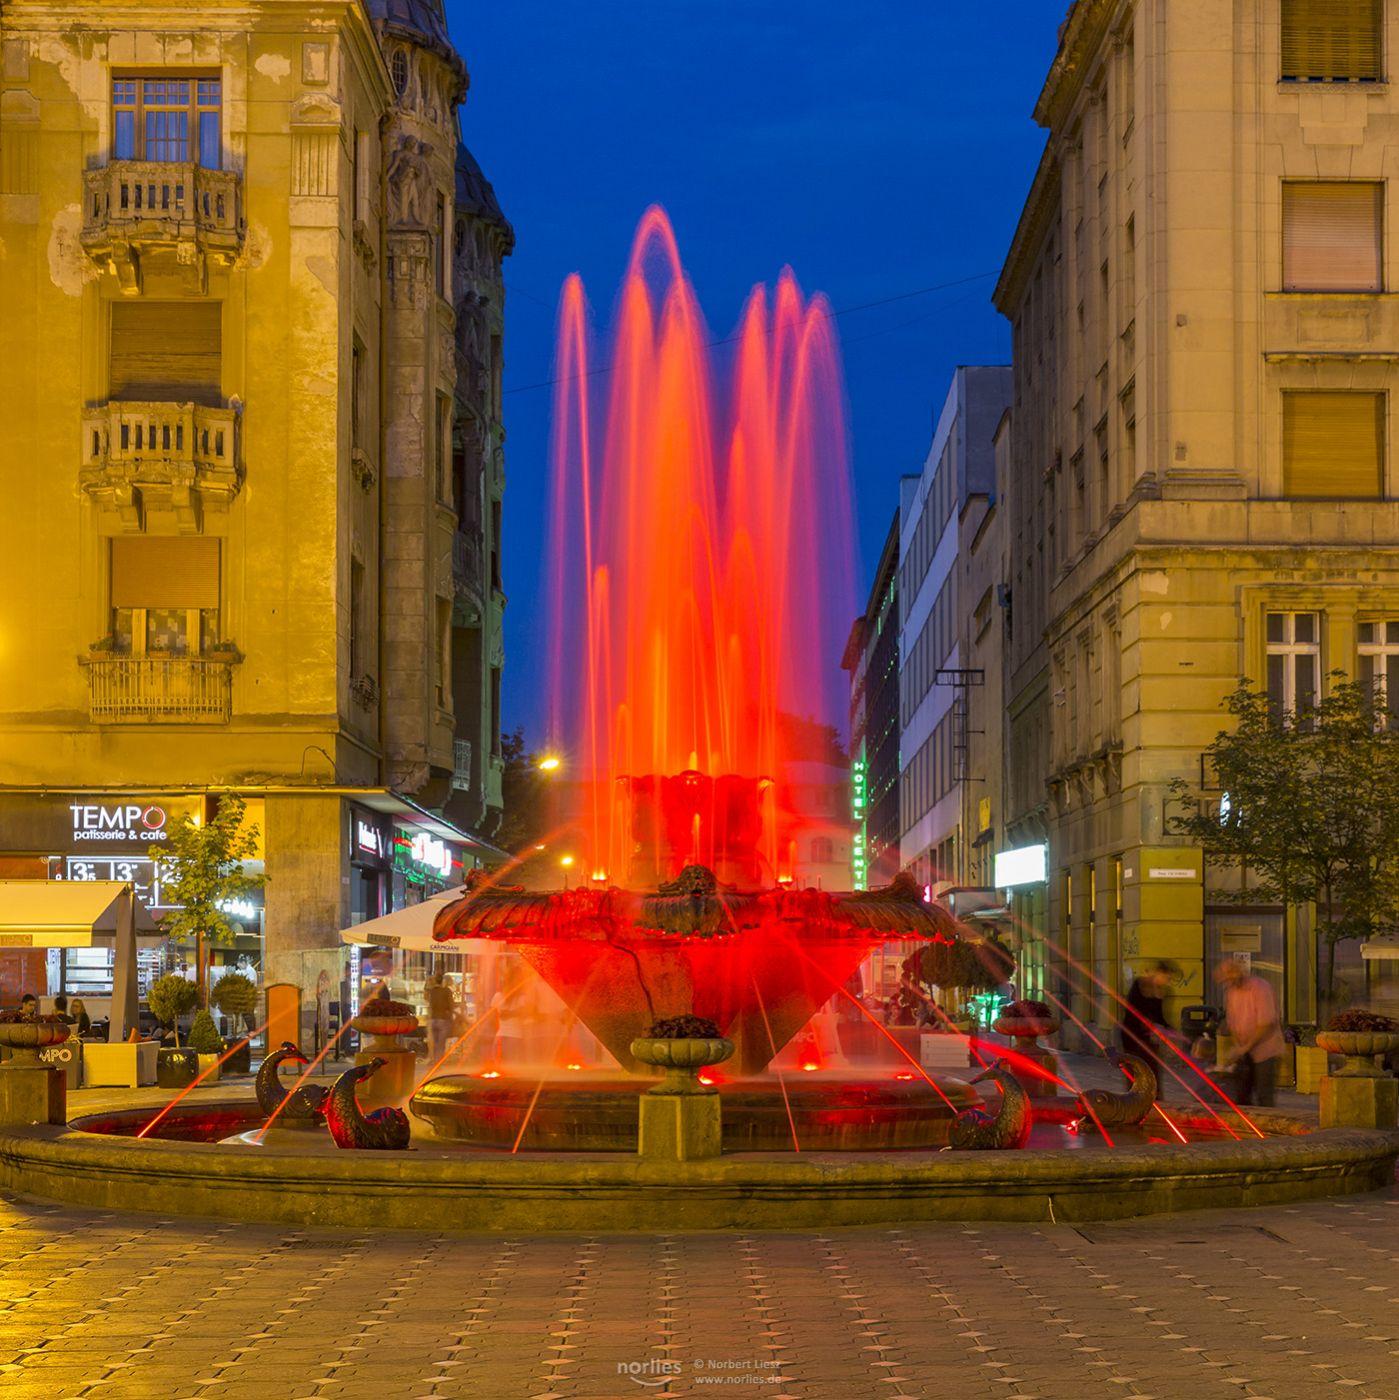 Fountain with Fish, Romania